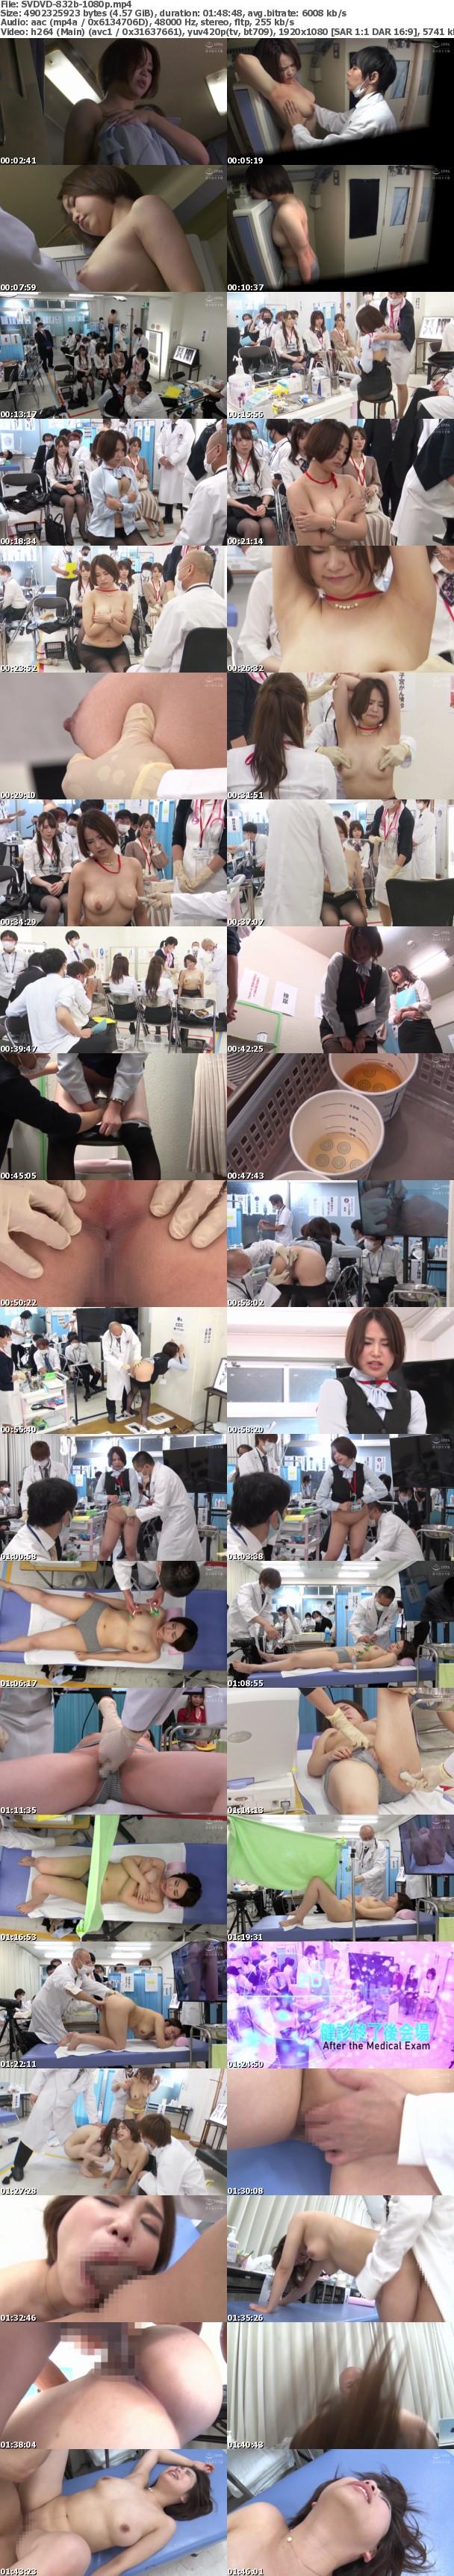 (Full HD) SVDVD-832 羞恥 ある日突然男女社員混合 強●OL健康診断2020 スペシャル 2枚組